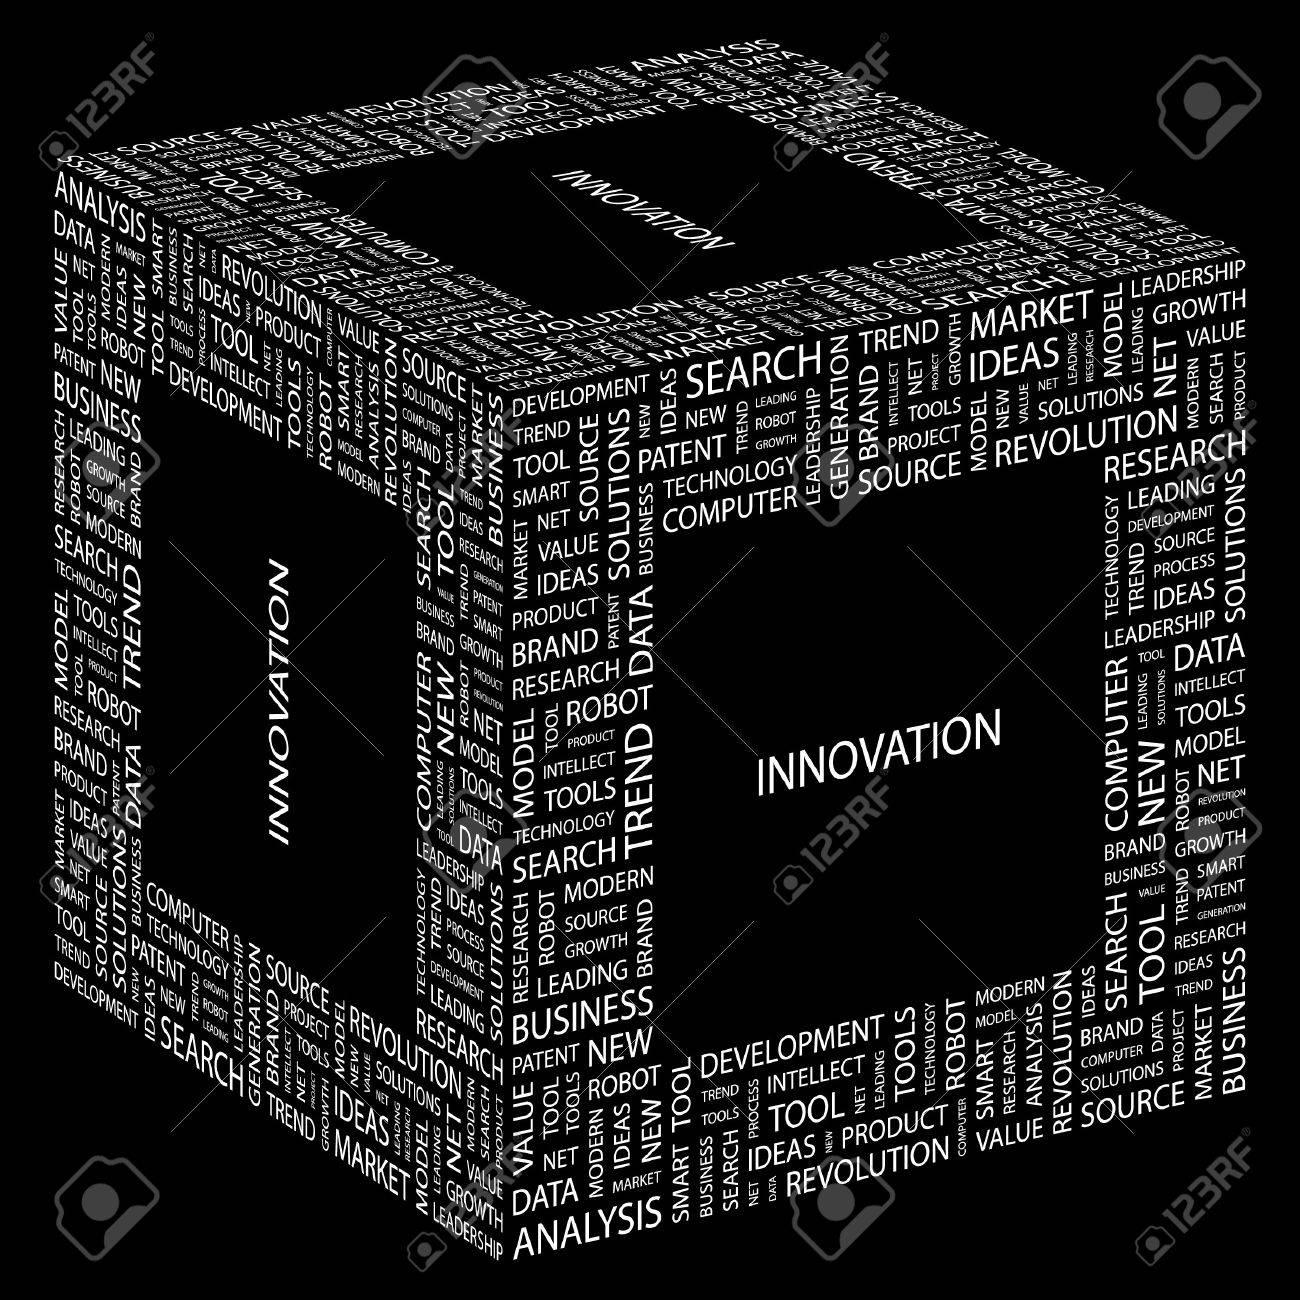 INNOVATION. Word collage on black background. illustration. Stock Vector - 7341524